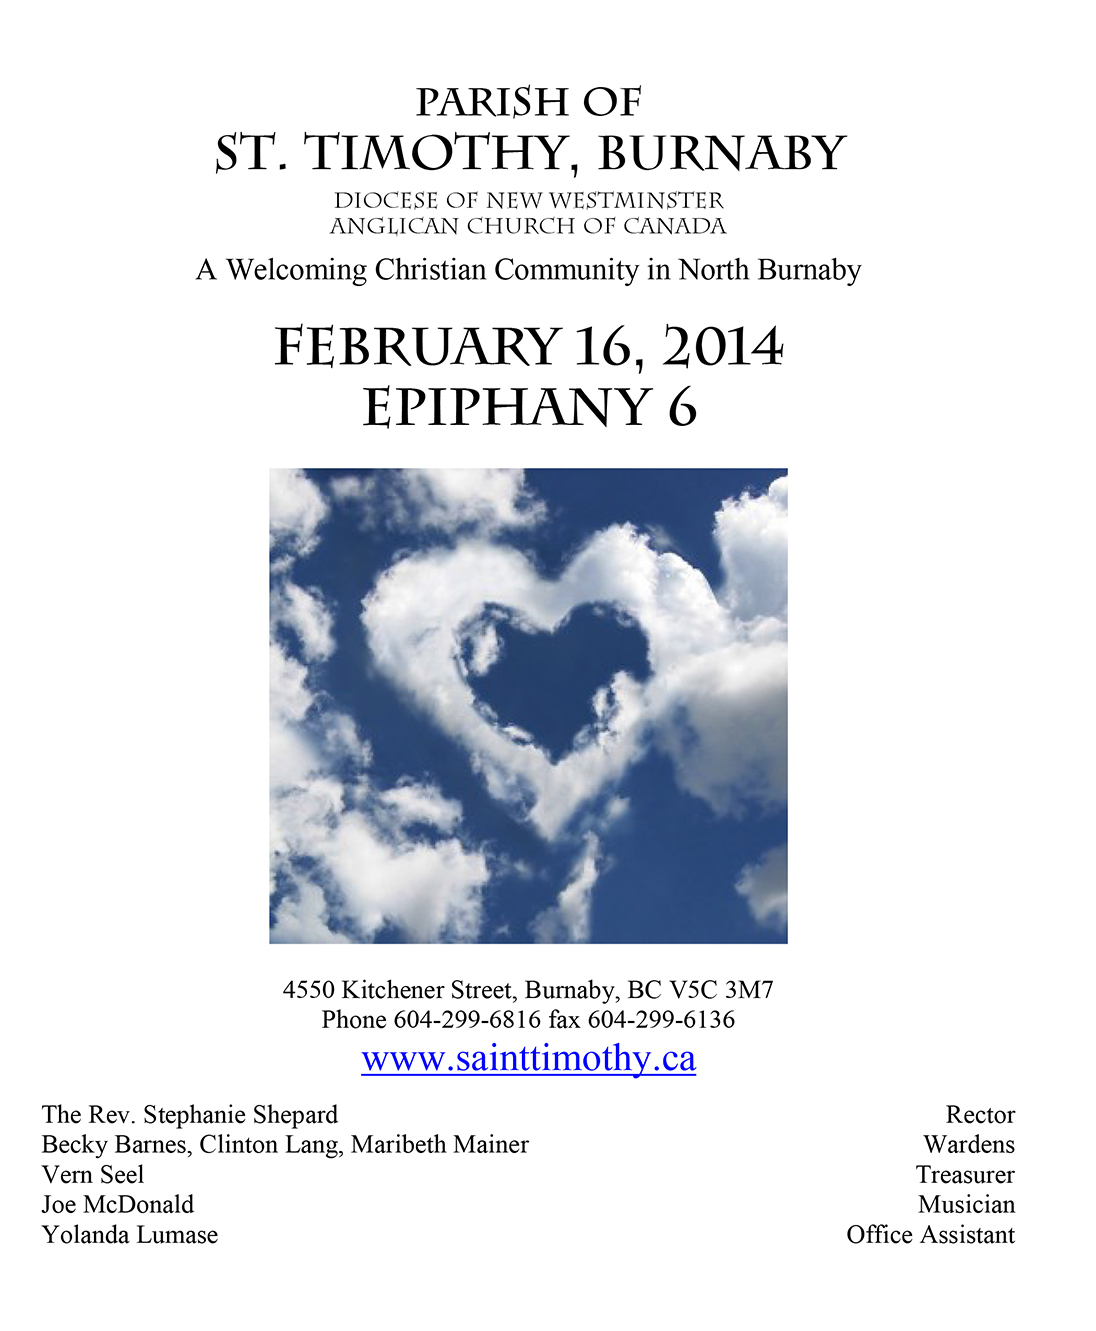 Bulletin: February 16, 2014